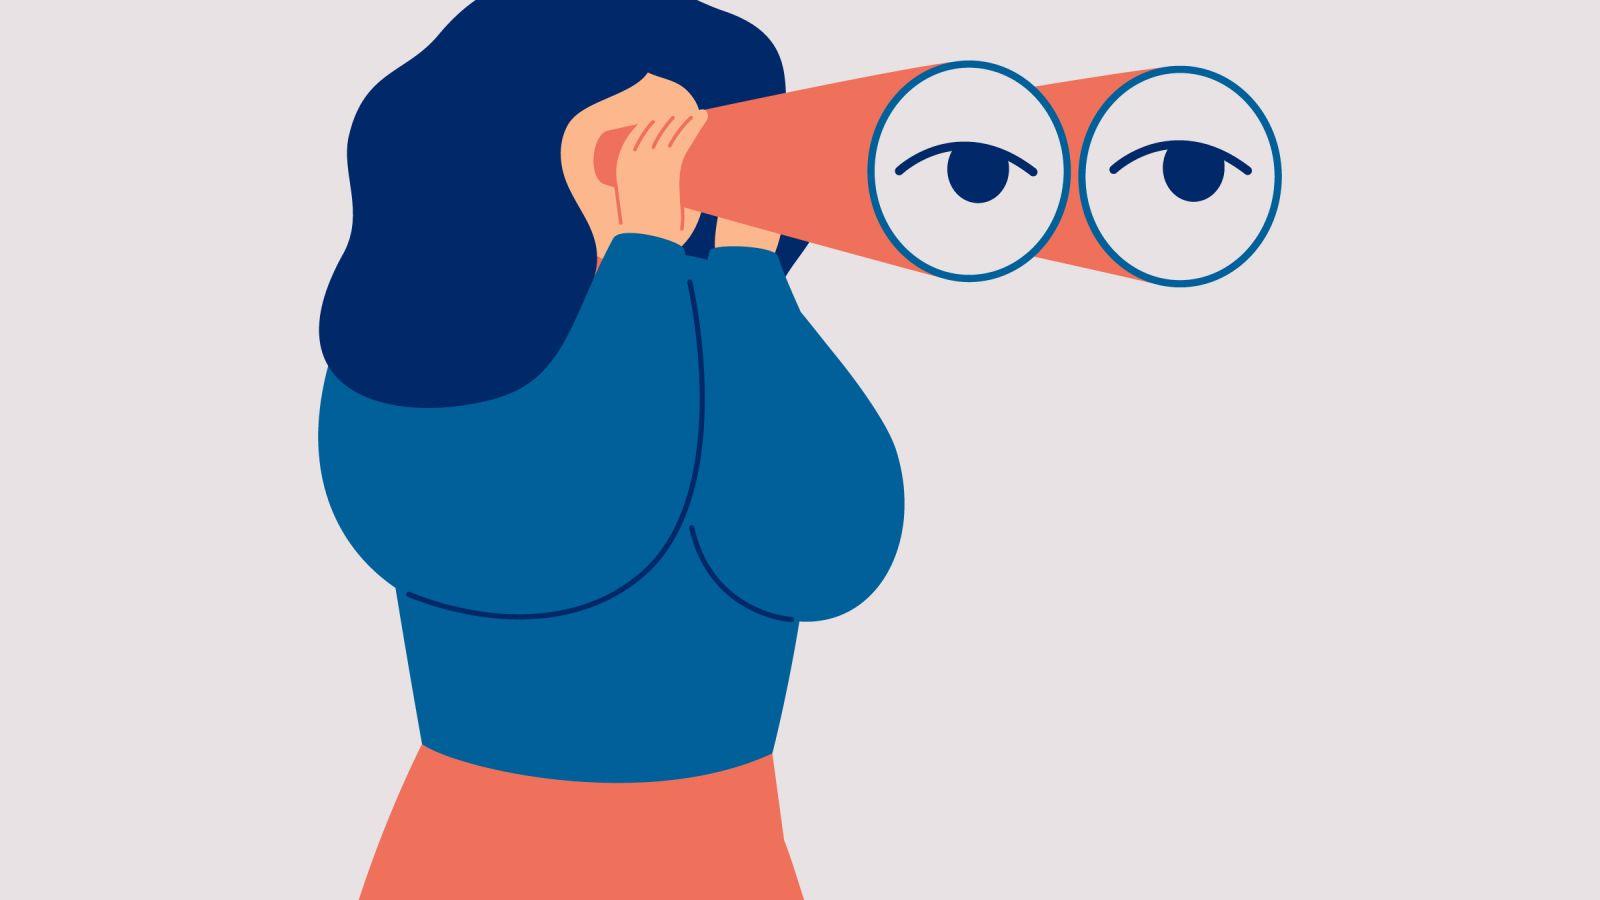 Woman with binoculars illustration